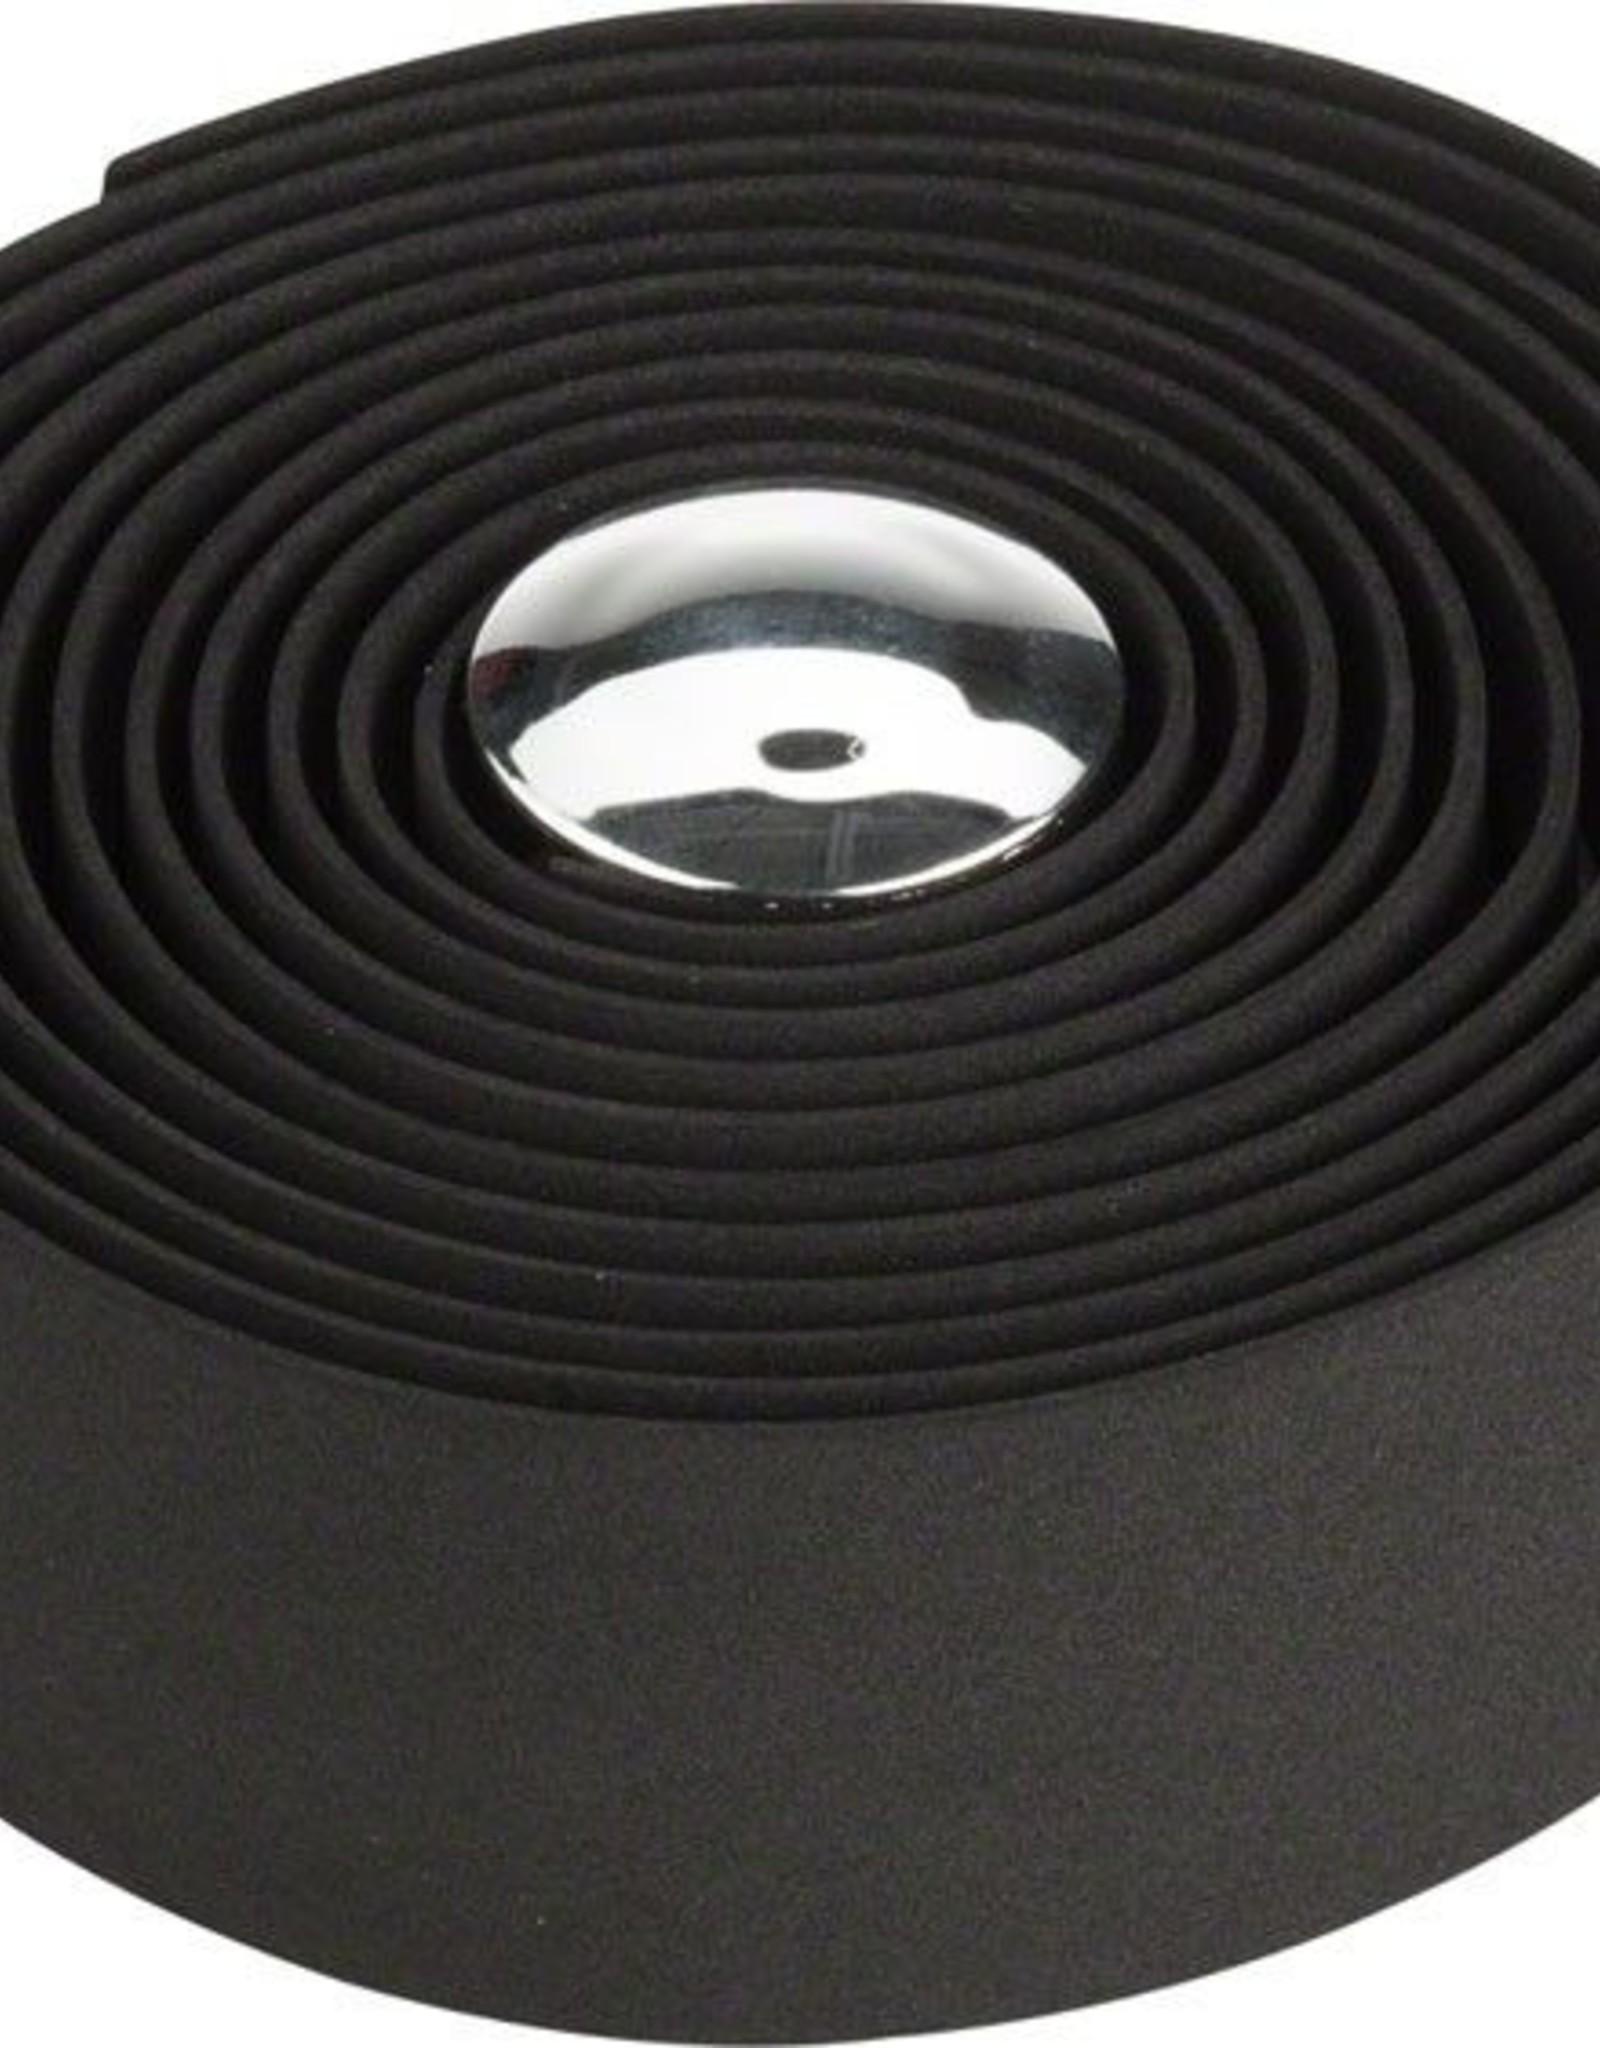 MSW HBT-100 EVA Black Handlebar Tape